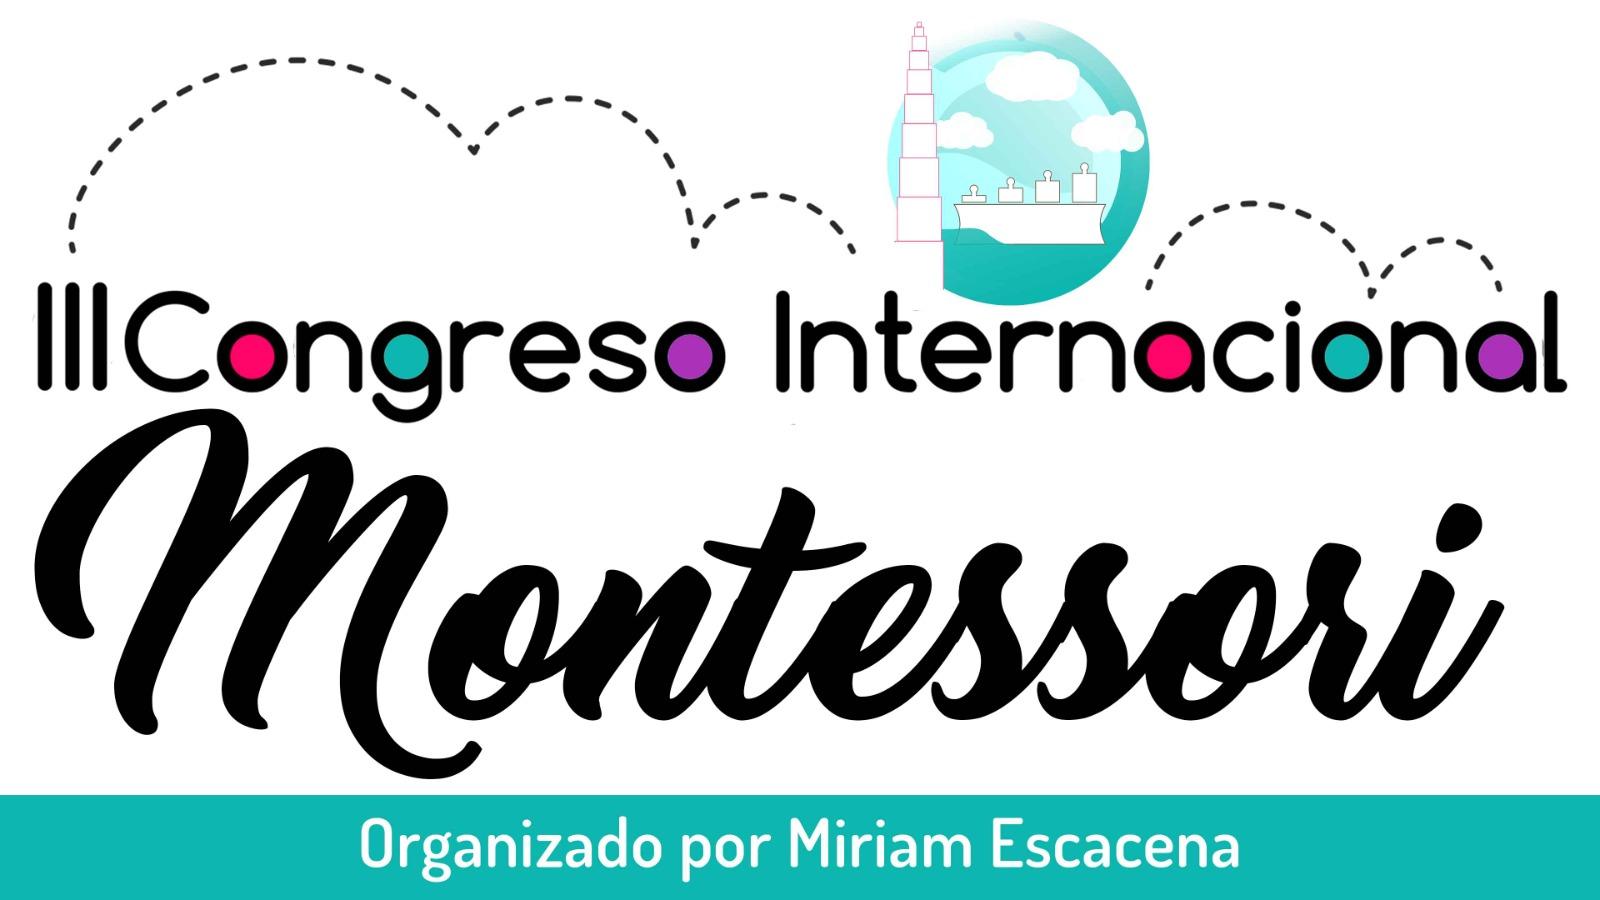 III Congreso Internacional Montessori